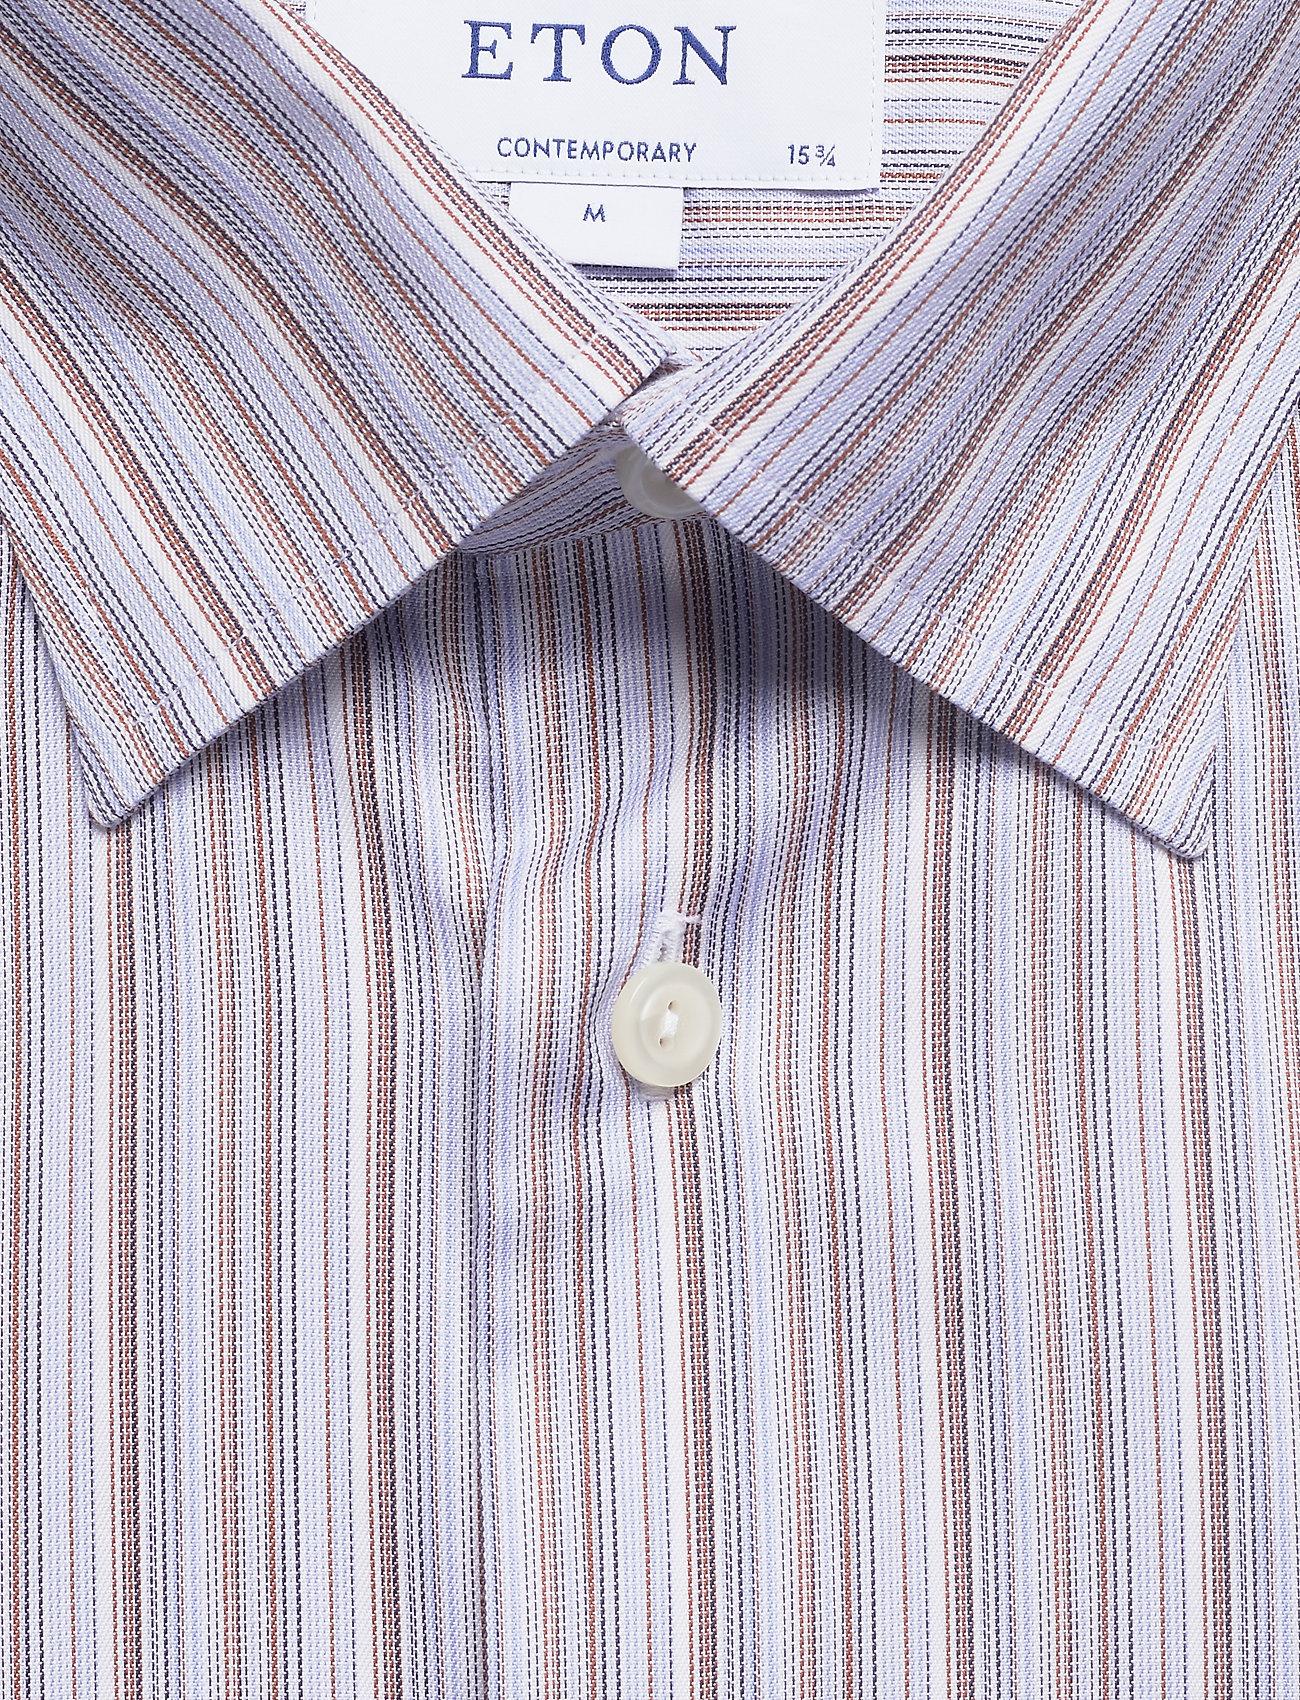 Striped Shirtpink Blueamp; Brown redEton Fine Twill QtdCshrx